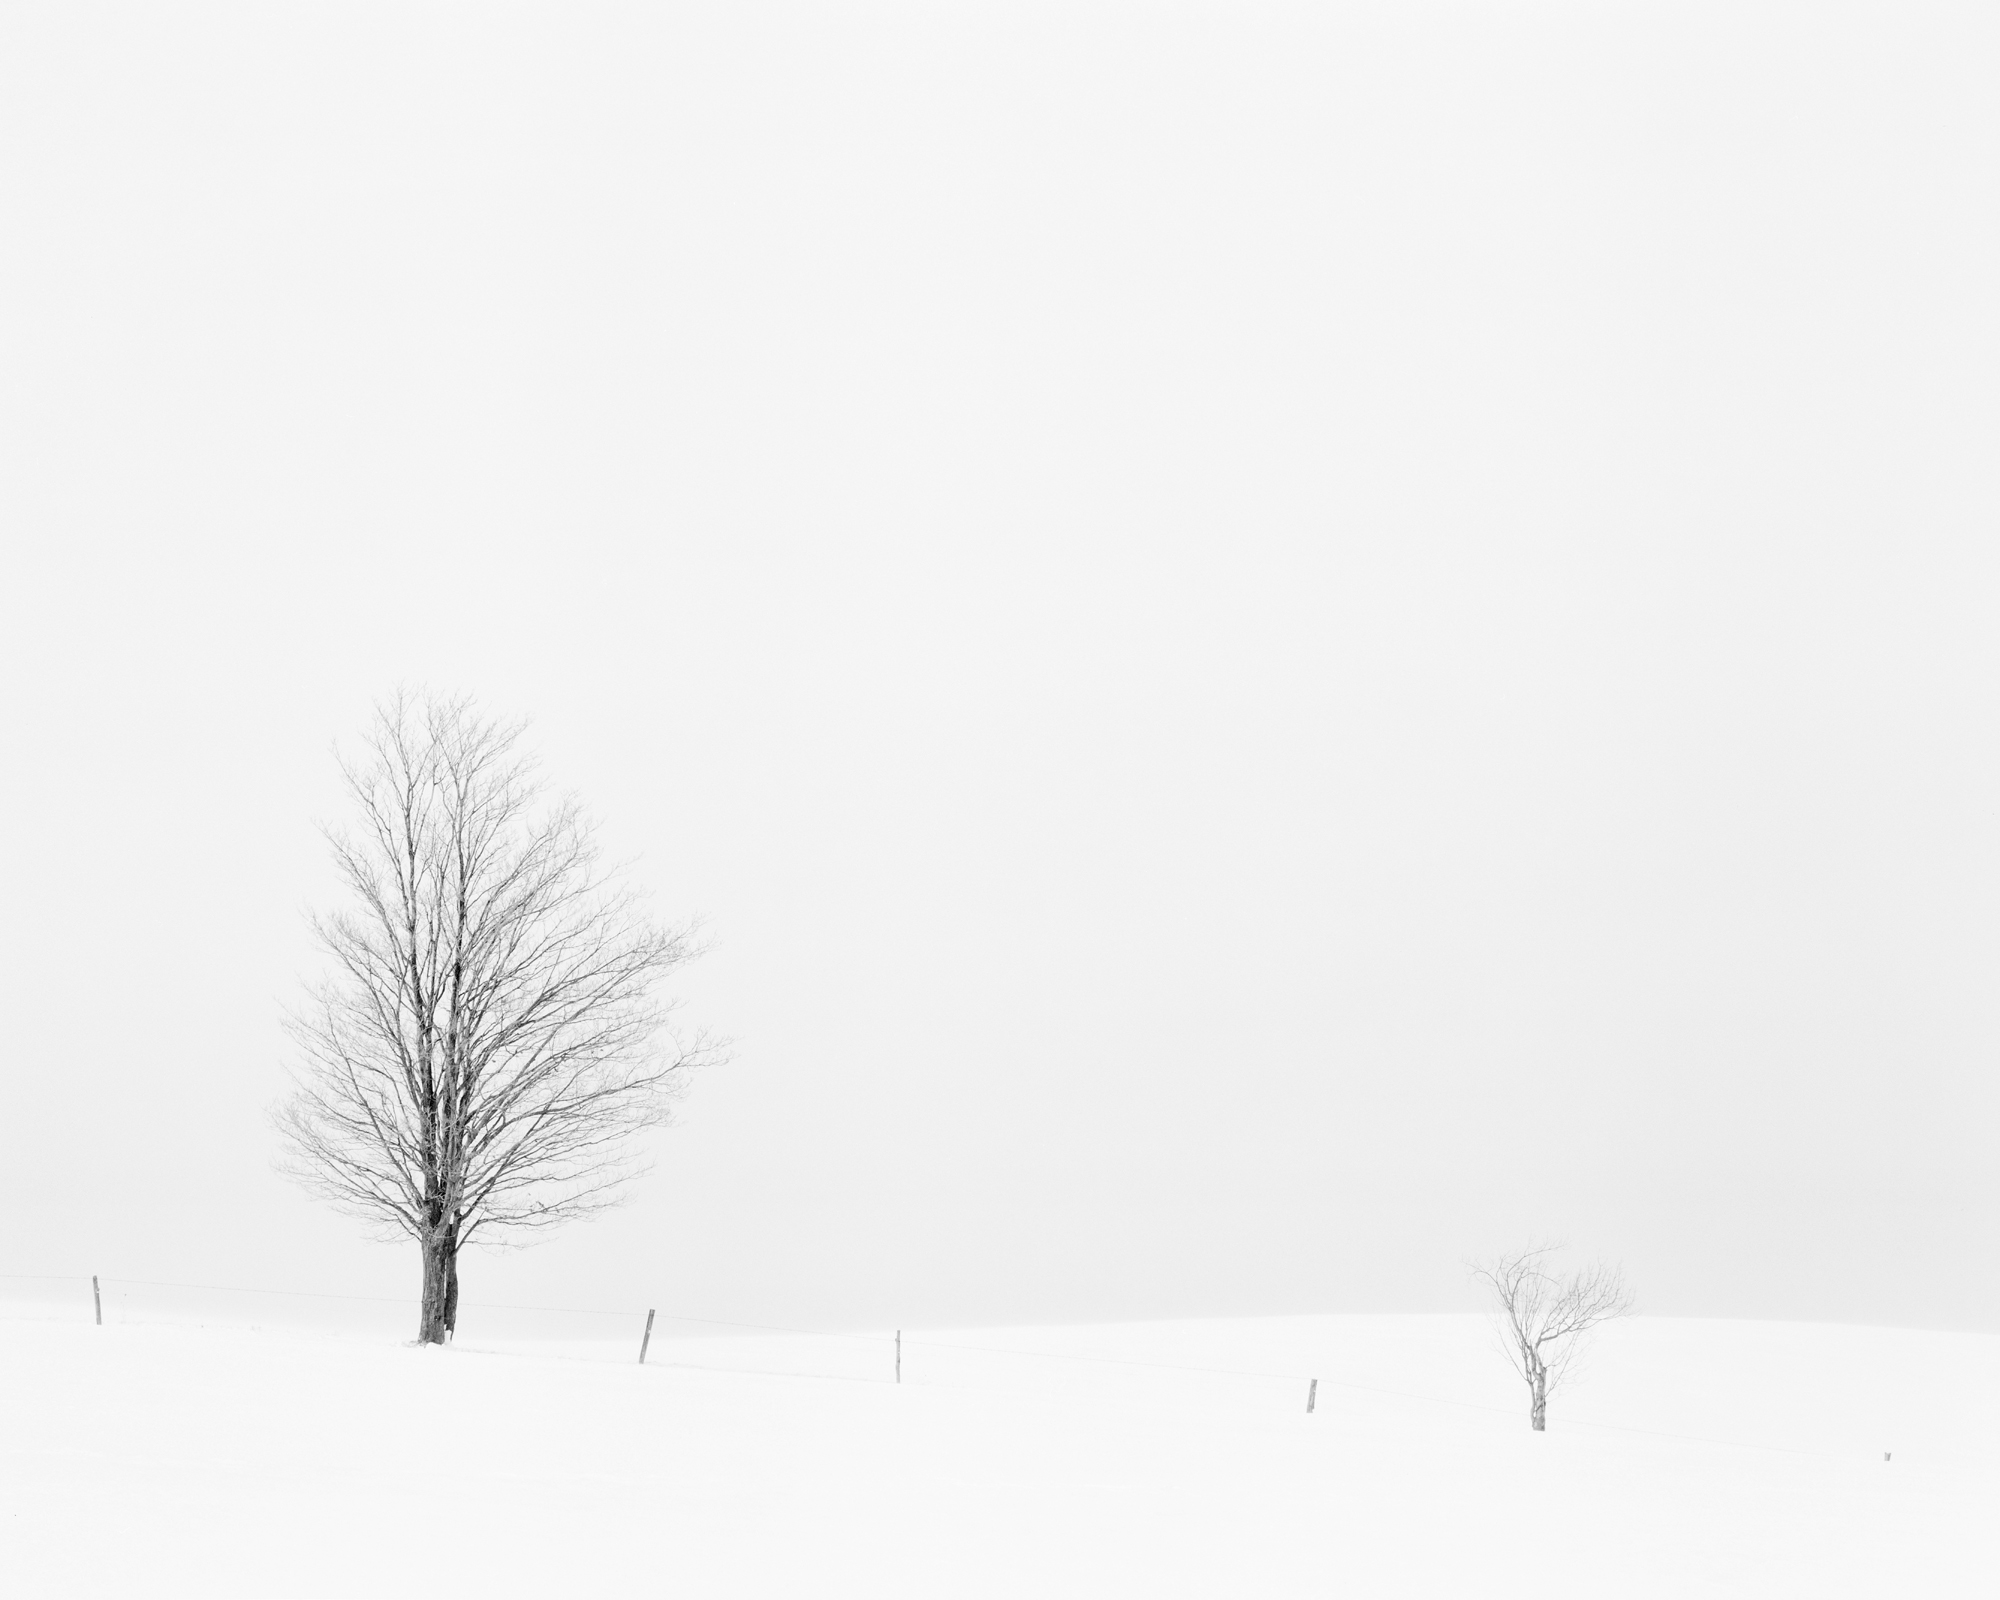 SNOW STUDY I